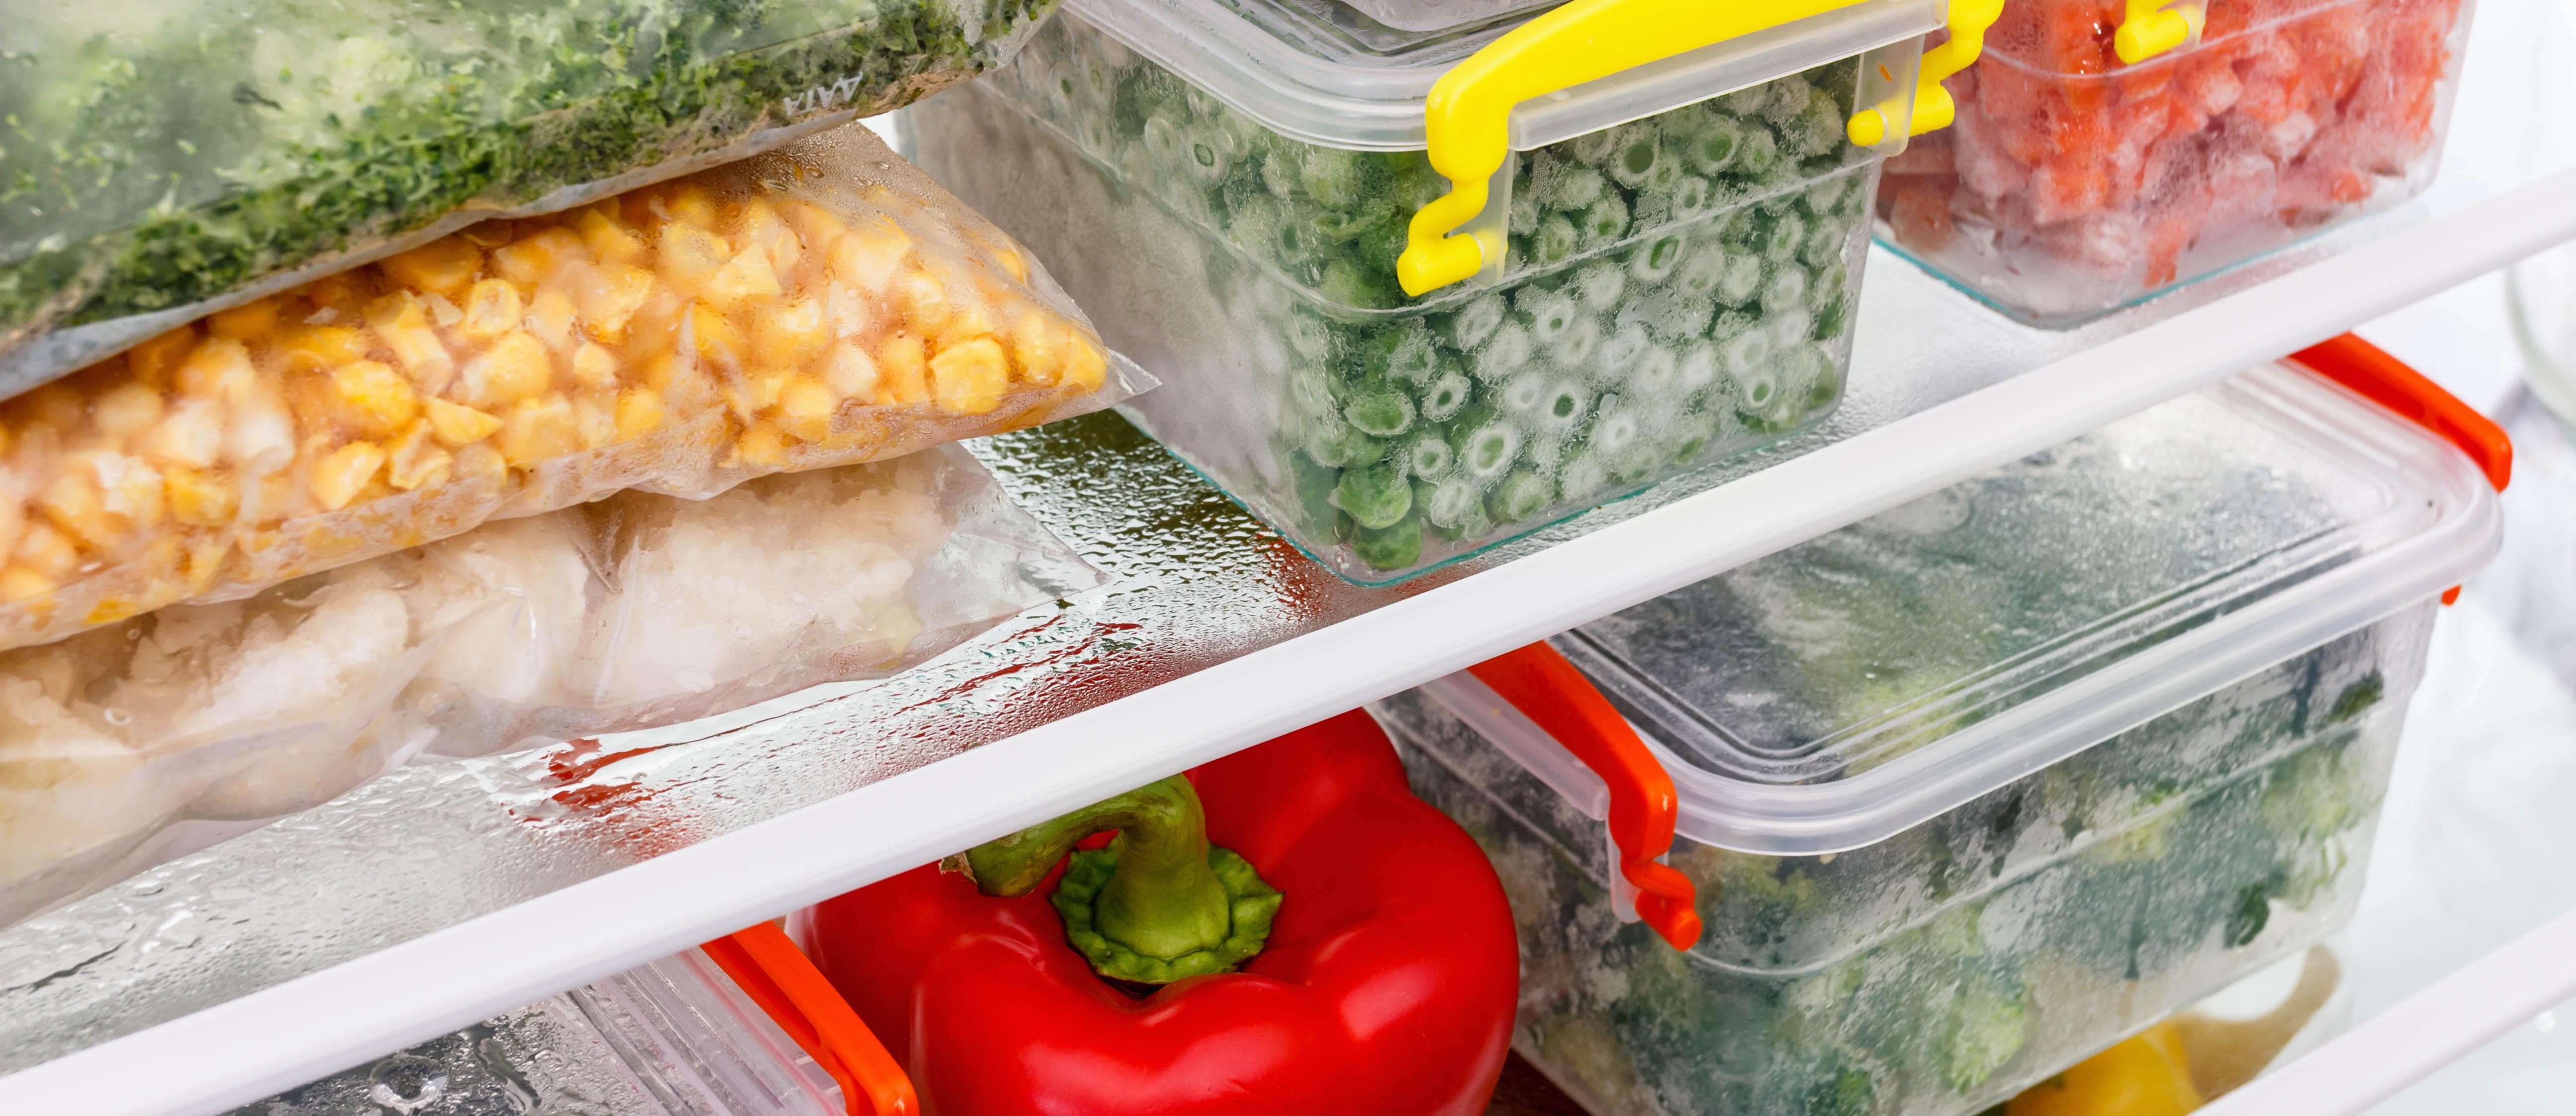 Food storage image